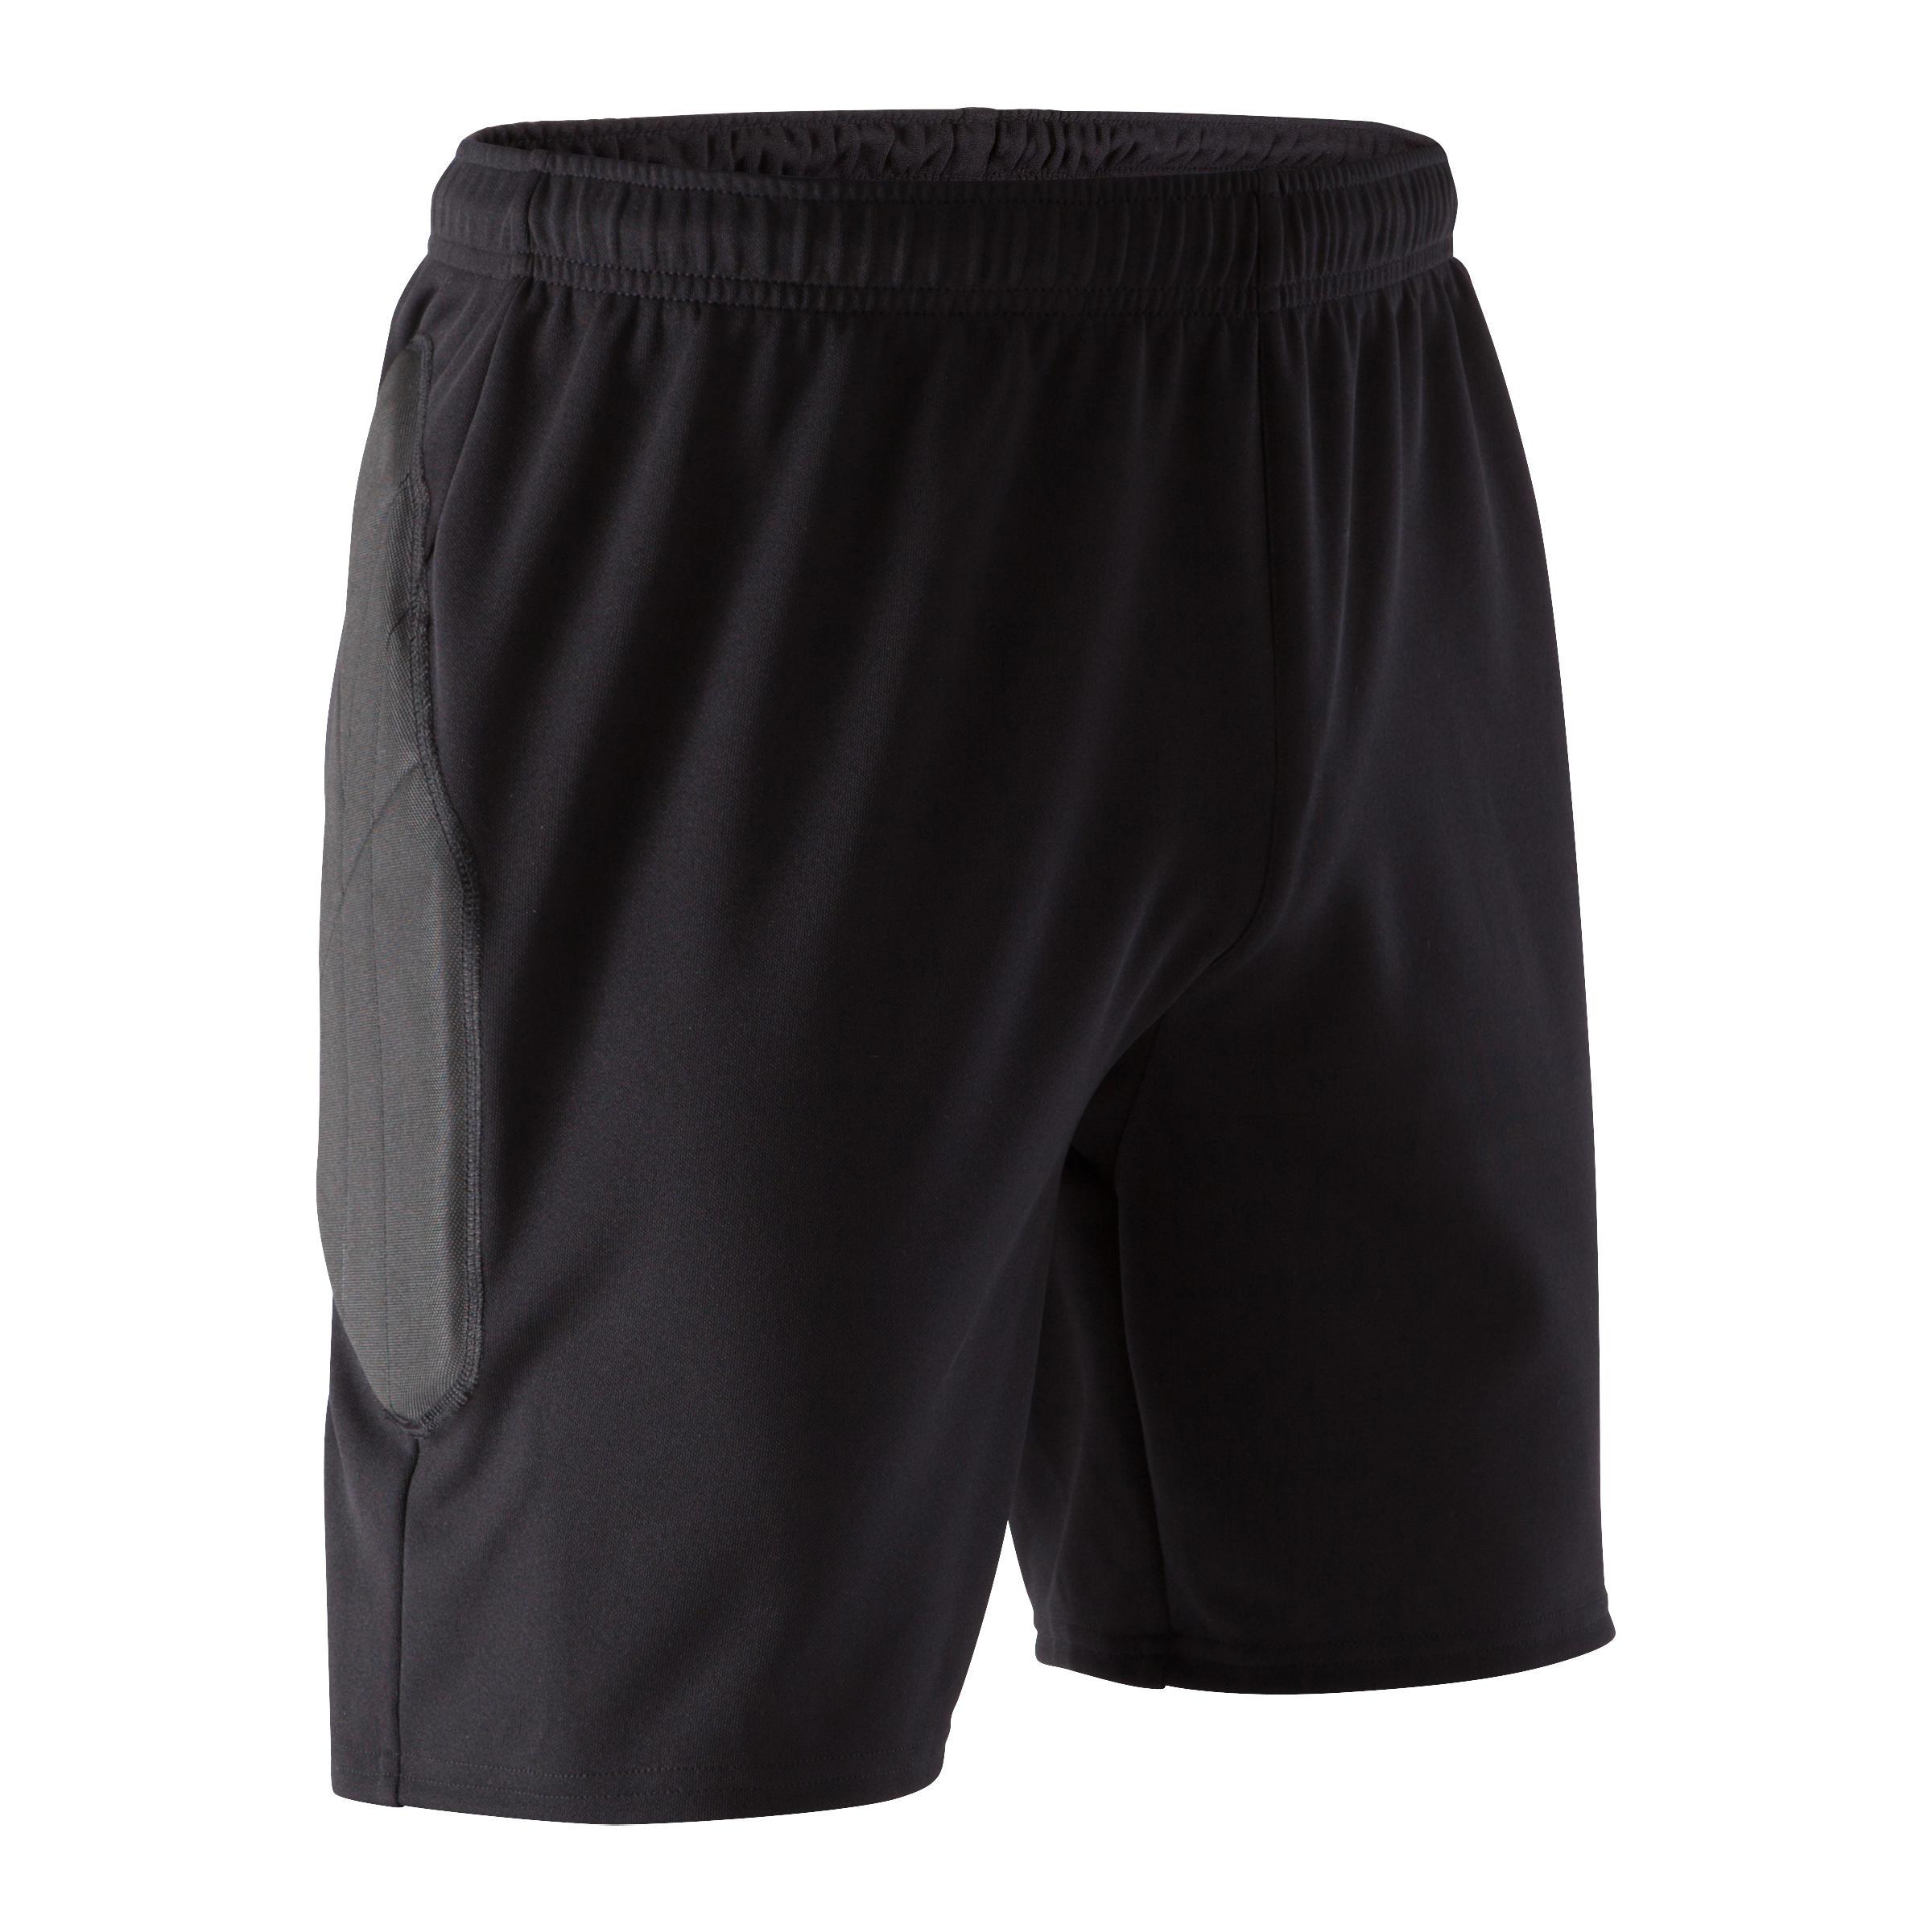 Torwarthose kurz F100 Erwachsene schwarz | Sportbekleidung > Sporthosen | Kipsta